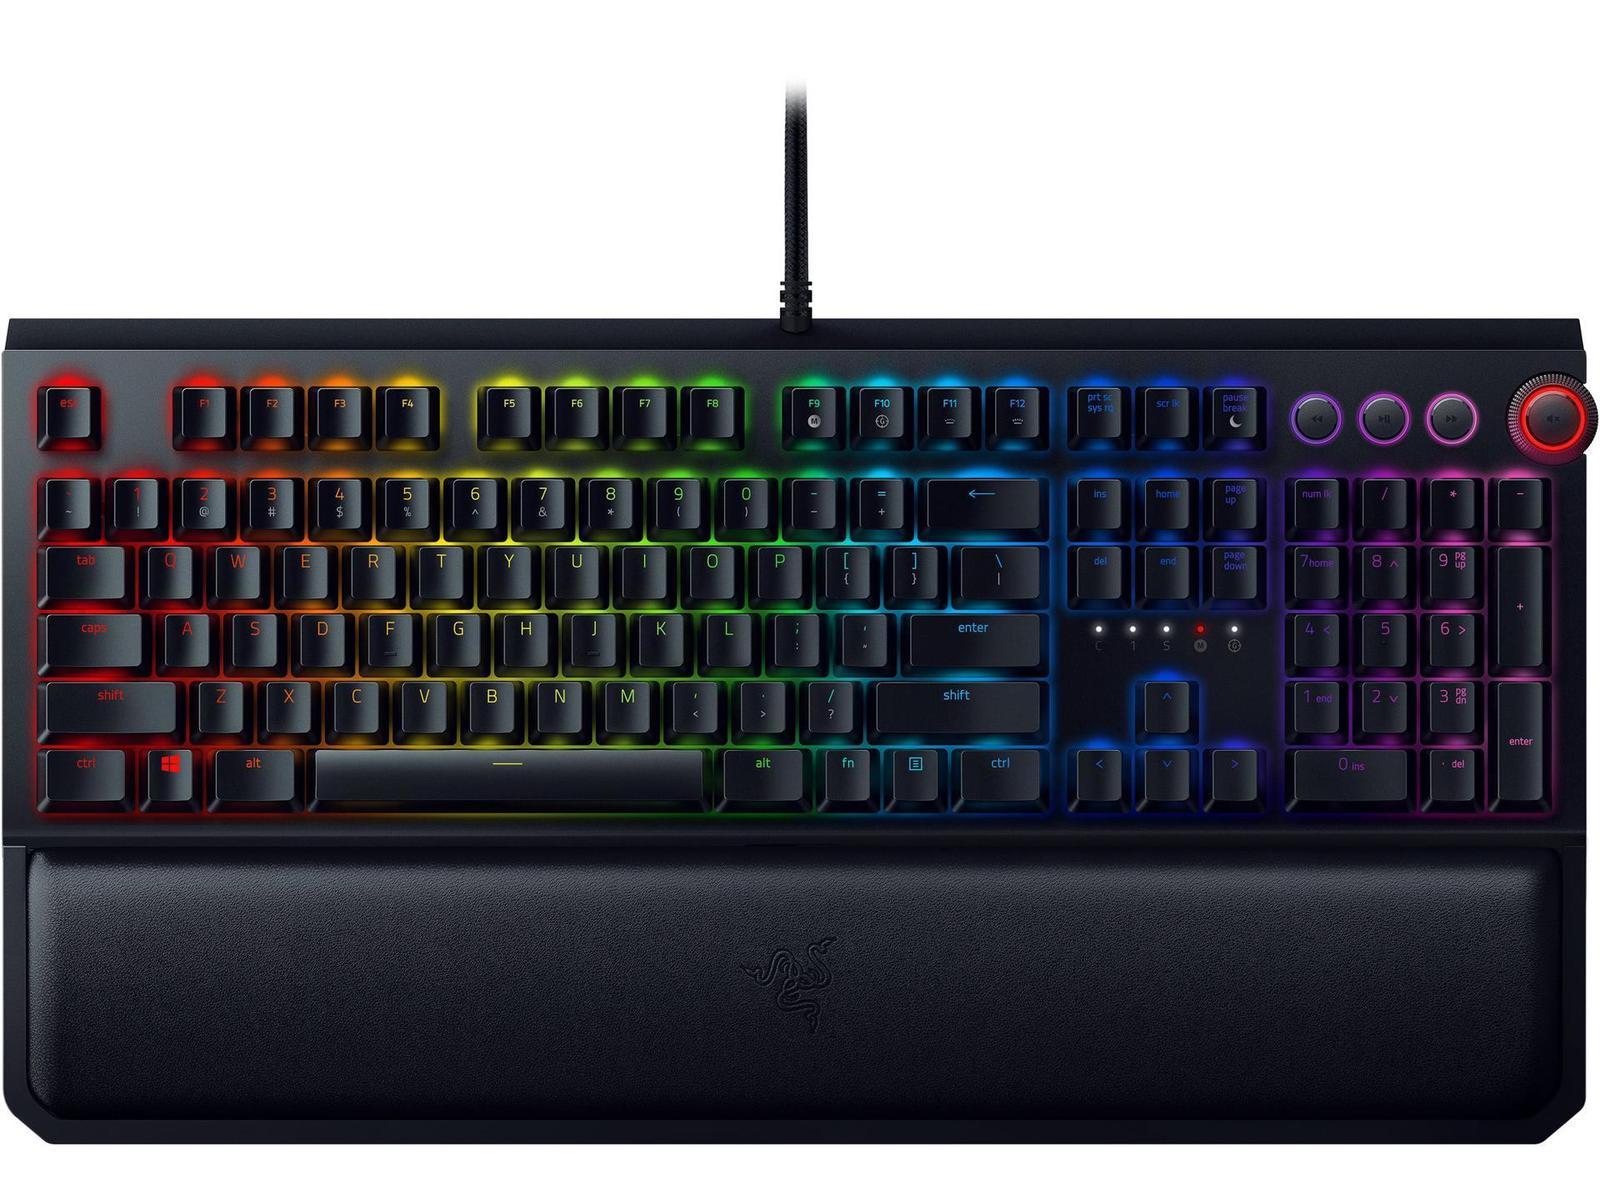 Razer BlackWidow Elite RGB Wired Gaming Keyboard